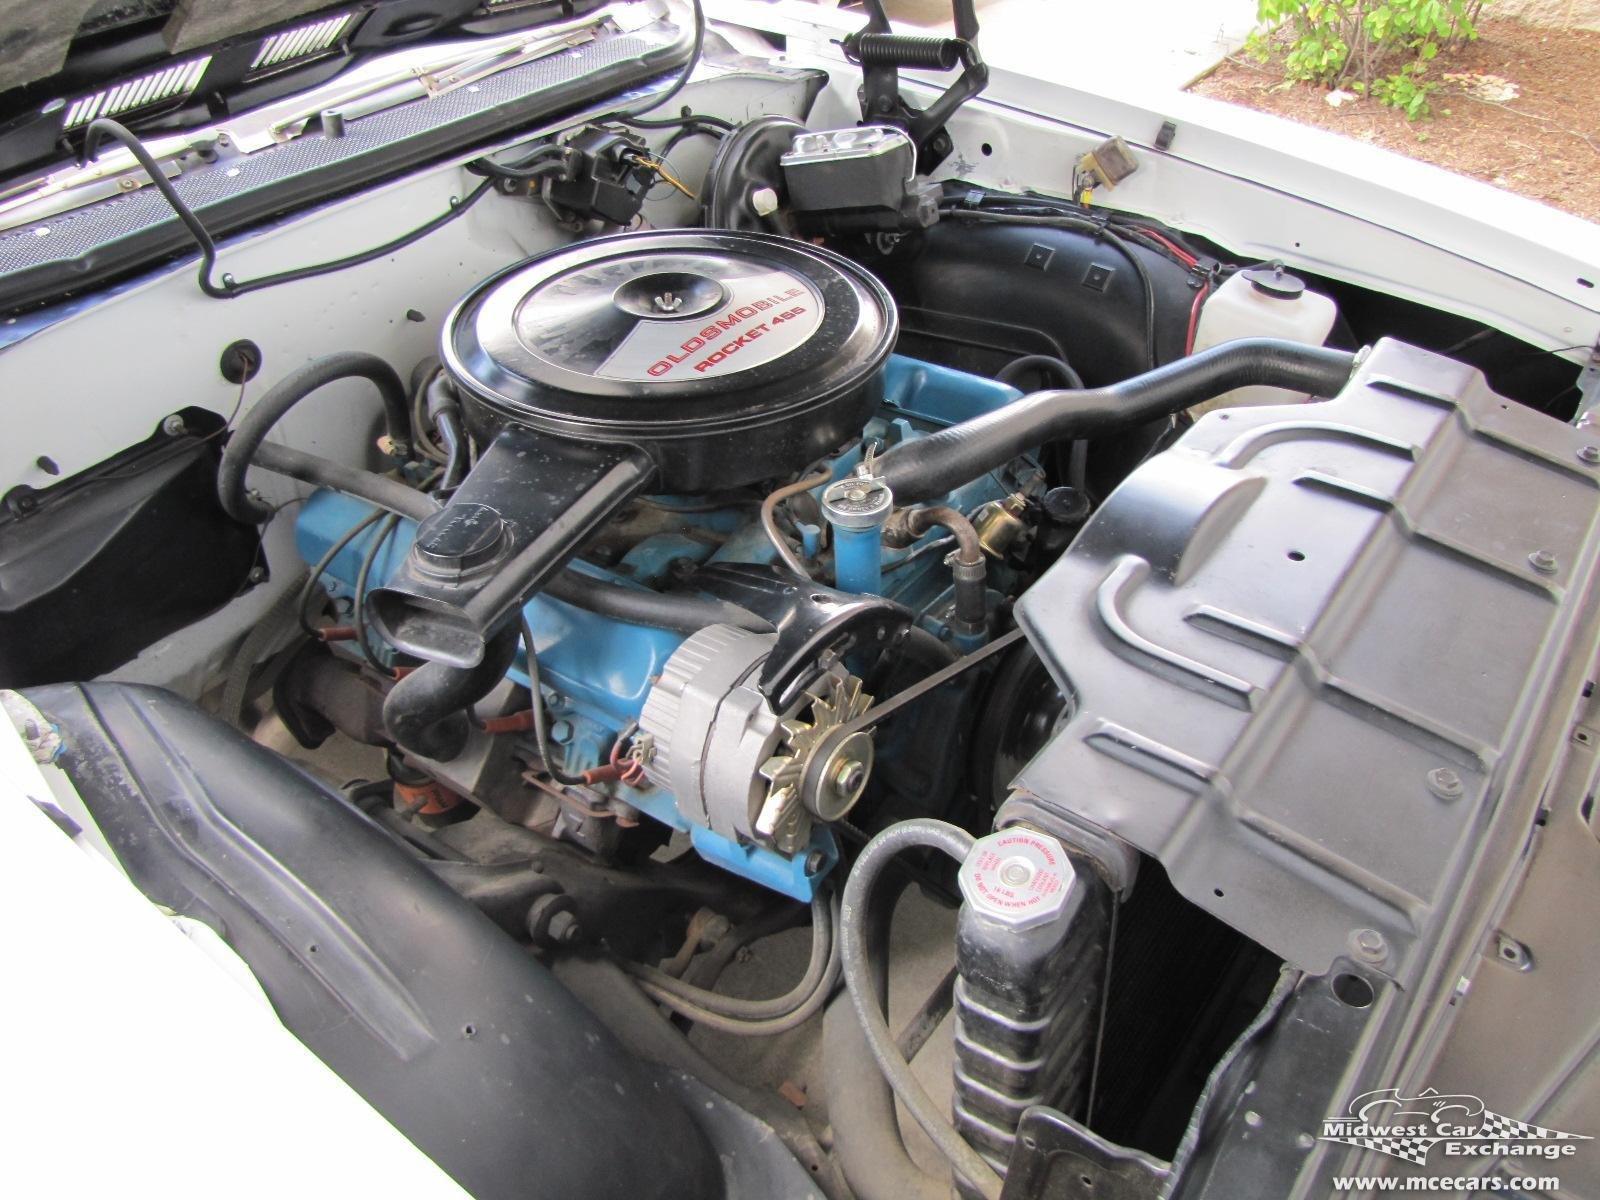 1970 Oldsmobile 442 | Midwest Car Exchange